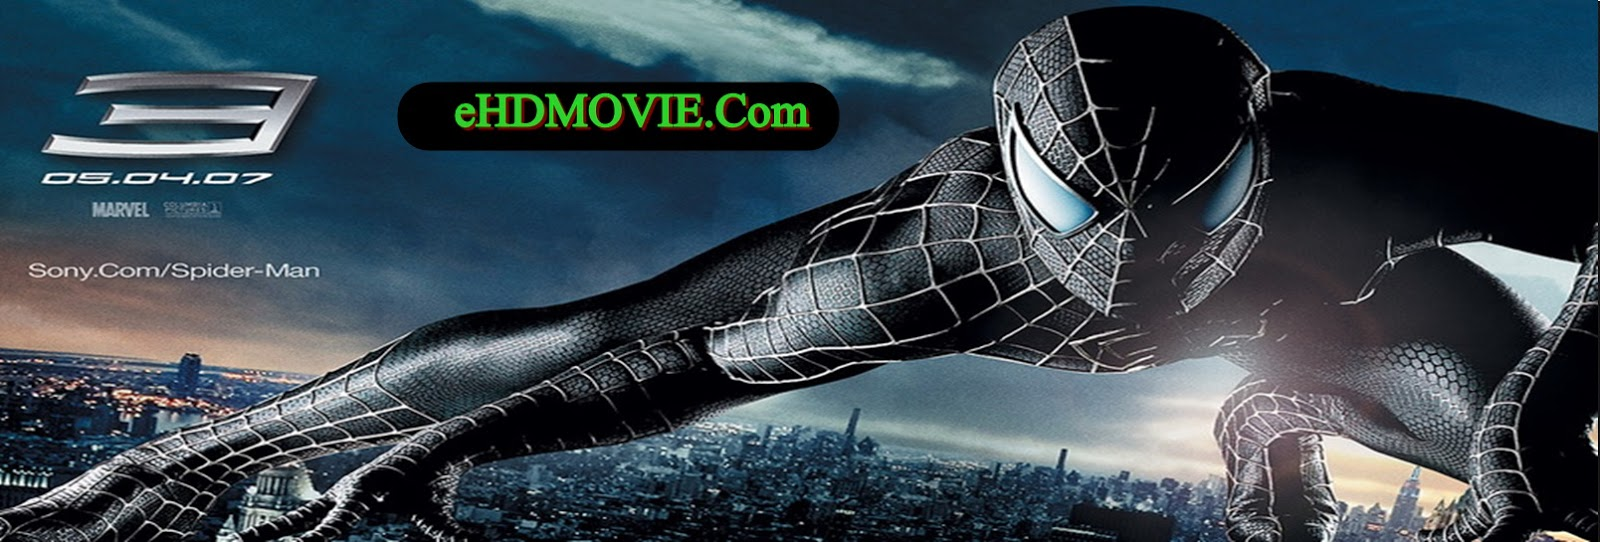 Spider-Man 3 2007 Full Movie Dual Audio [Hindi – English] 1080p - 720p - 480p ORG BRRip 350MB - 1GB - 2.3GB ESubs Free Download